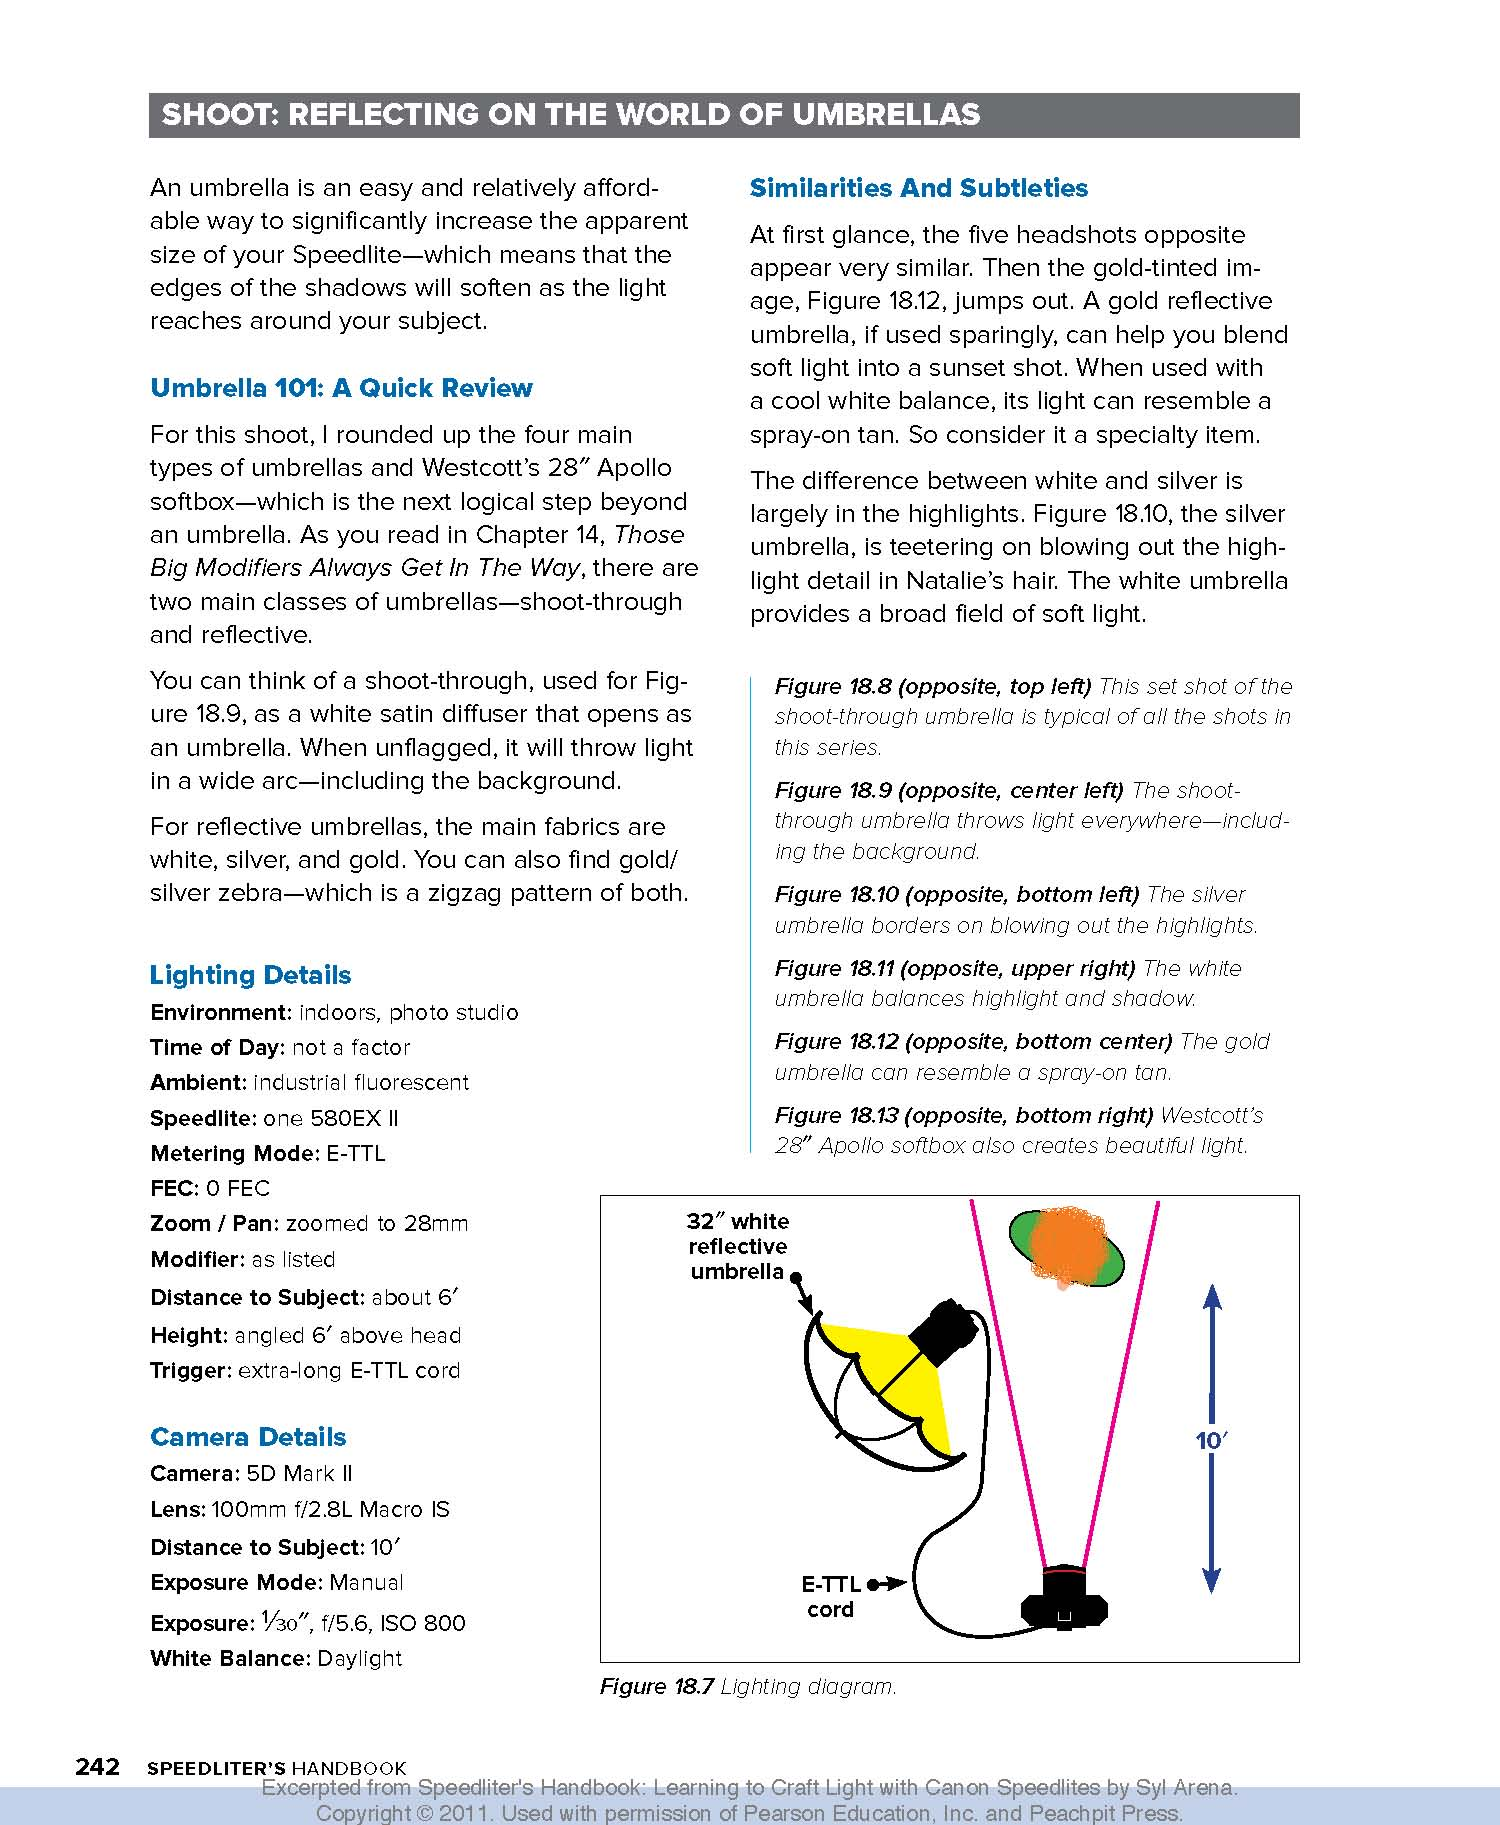 Syl Arena Speedliters Handbook Pdf